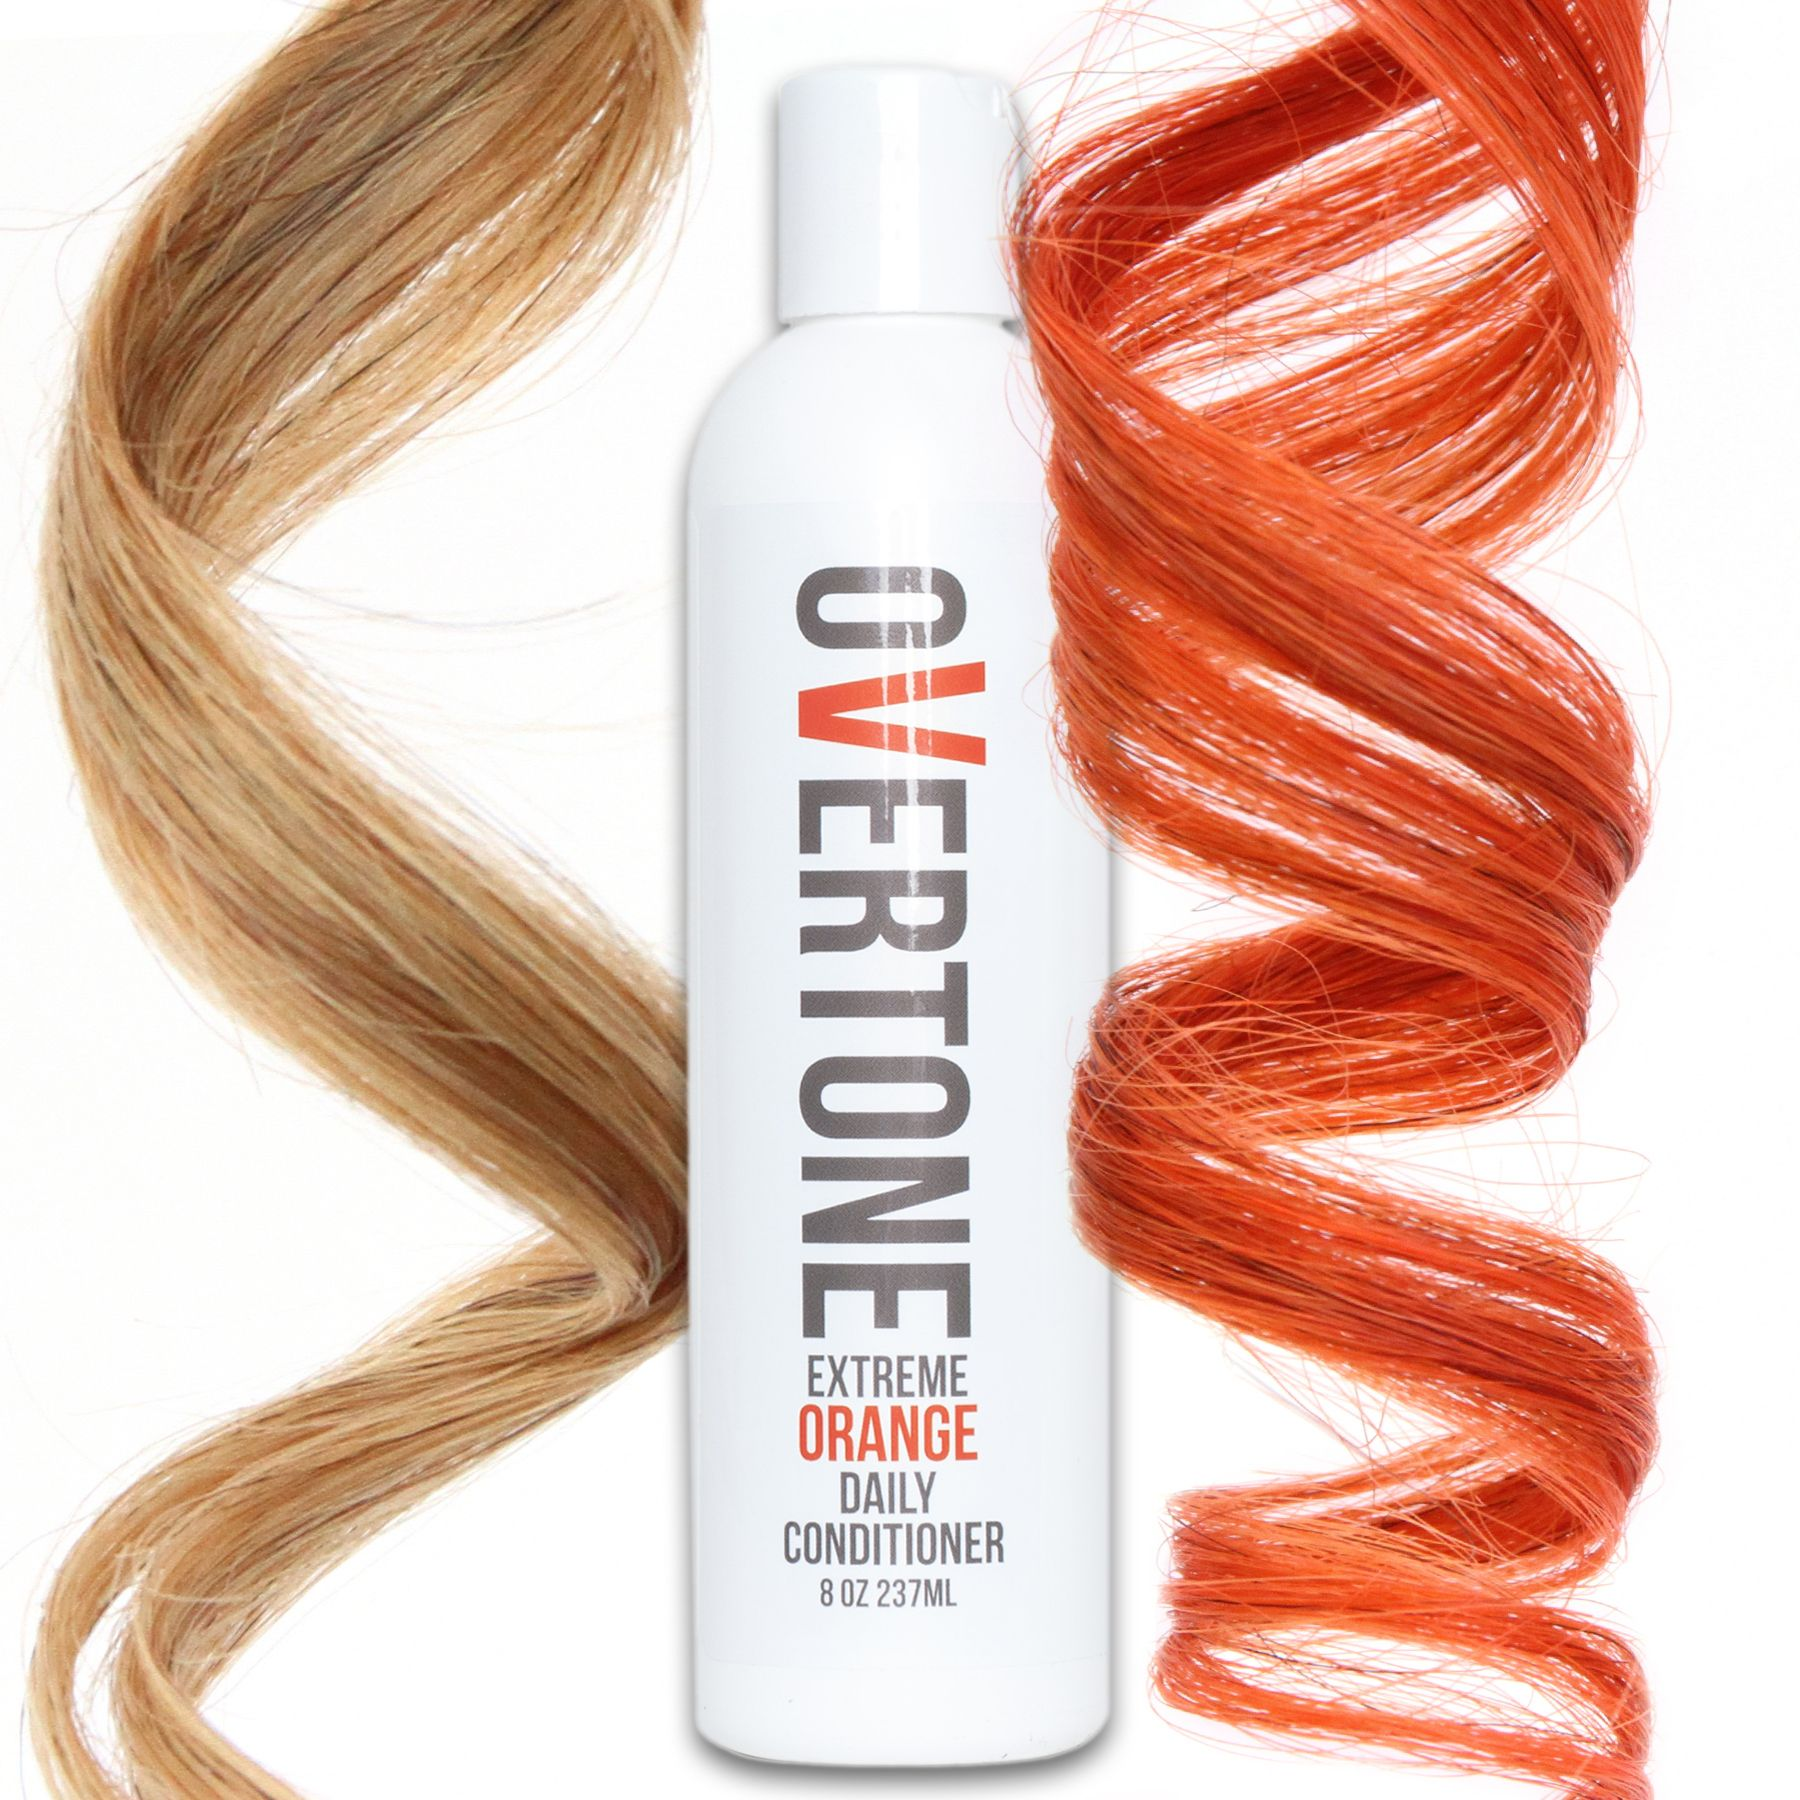 Extreme Orange Daily Conditioner Hair Dye Shampoo Medium Blonde